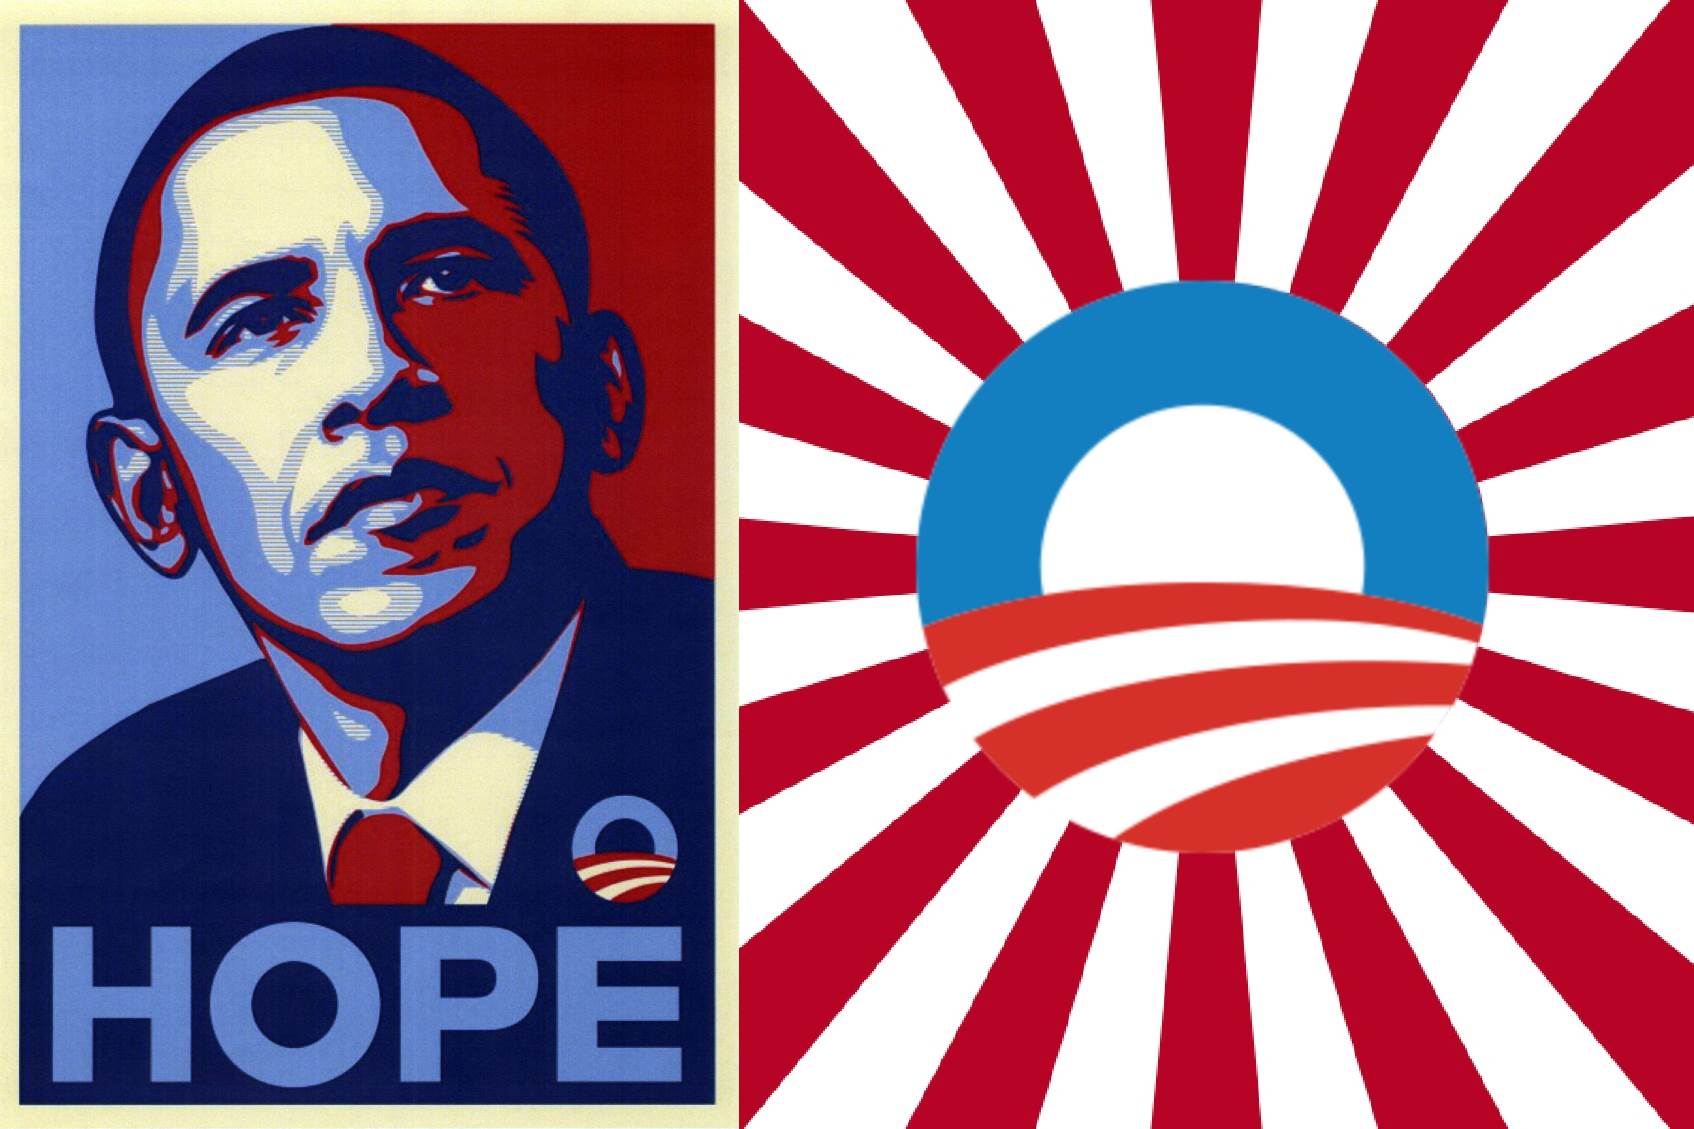 Политический брендинг